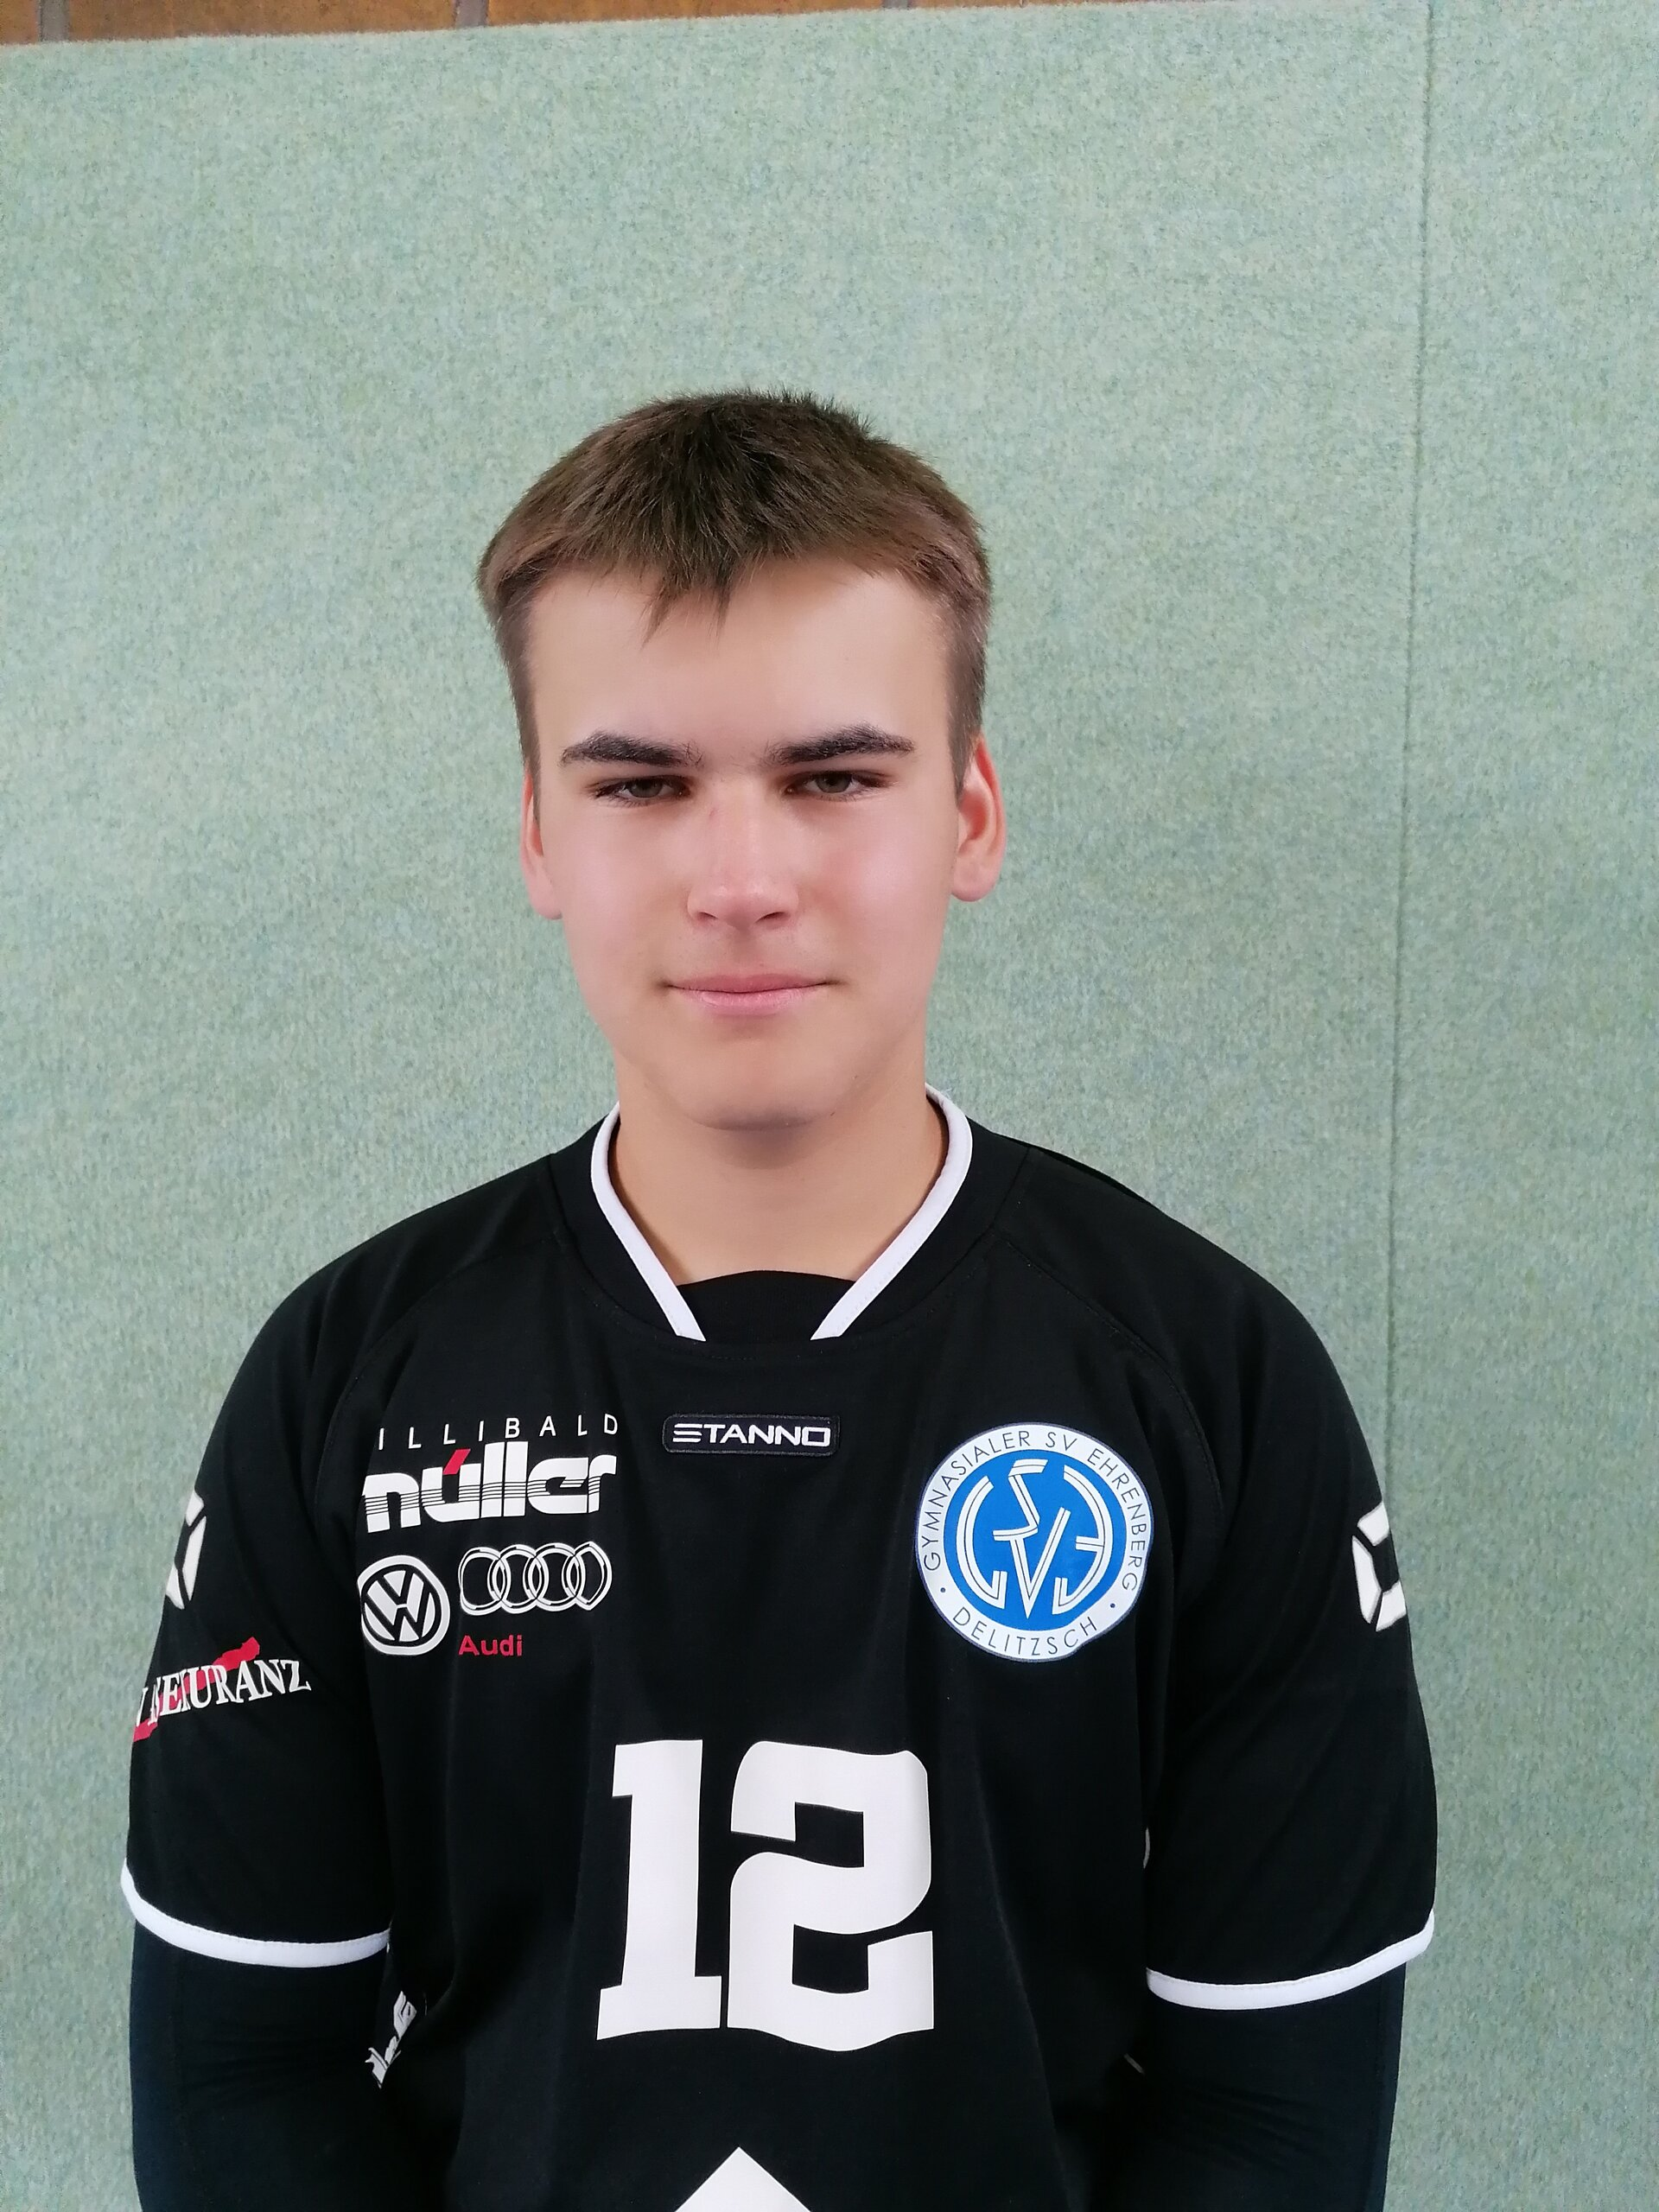 Anton Karl Gericke